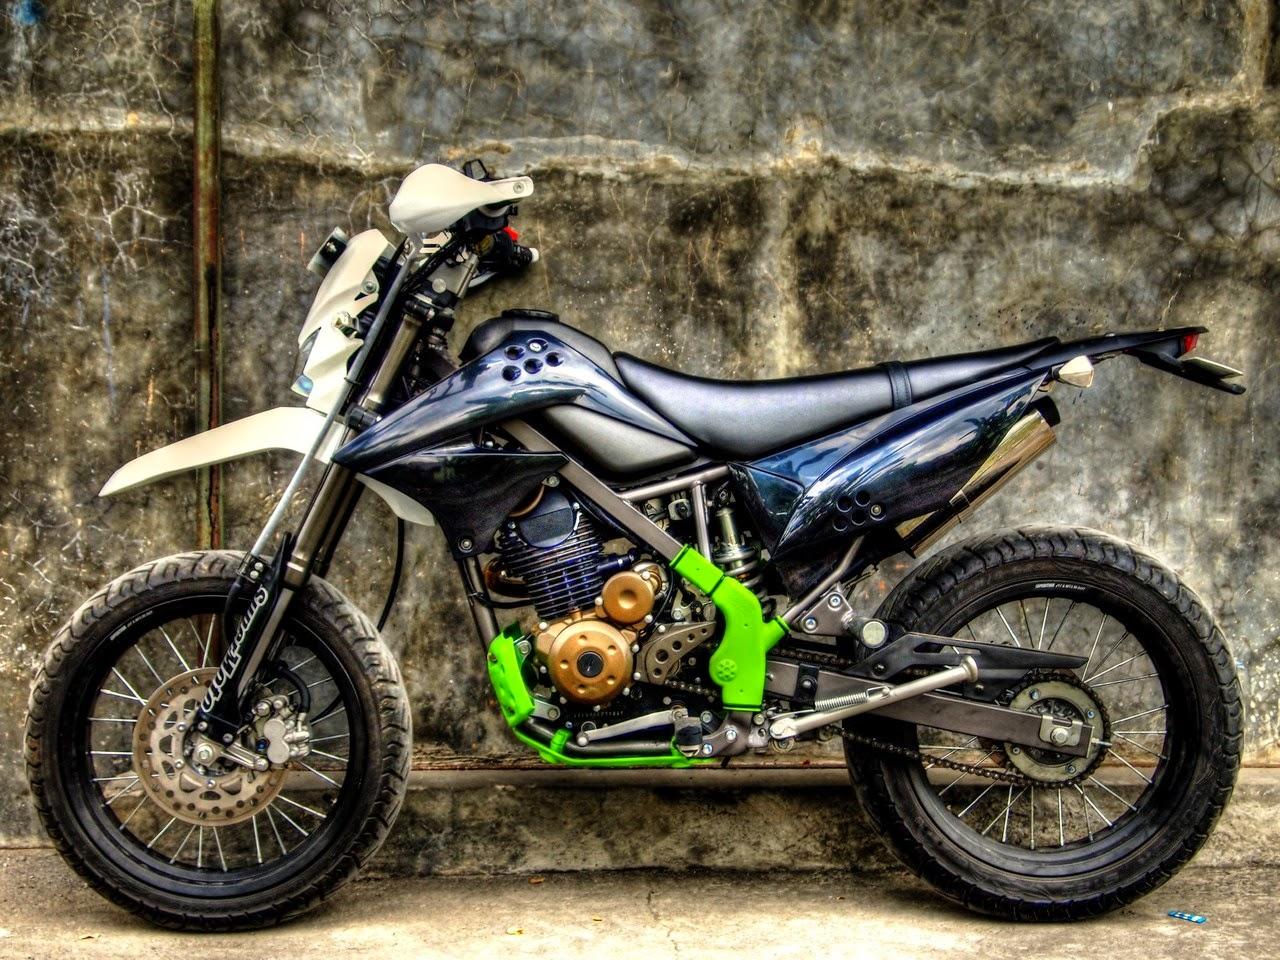 Kumpulan Foto Modifikasi Motor Kawasaki Klx Terbaru Modispik Motor